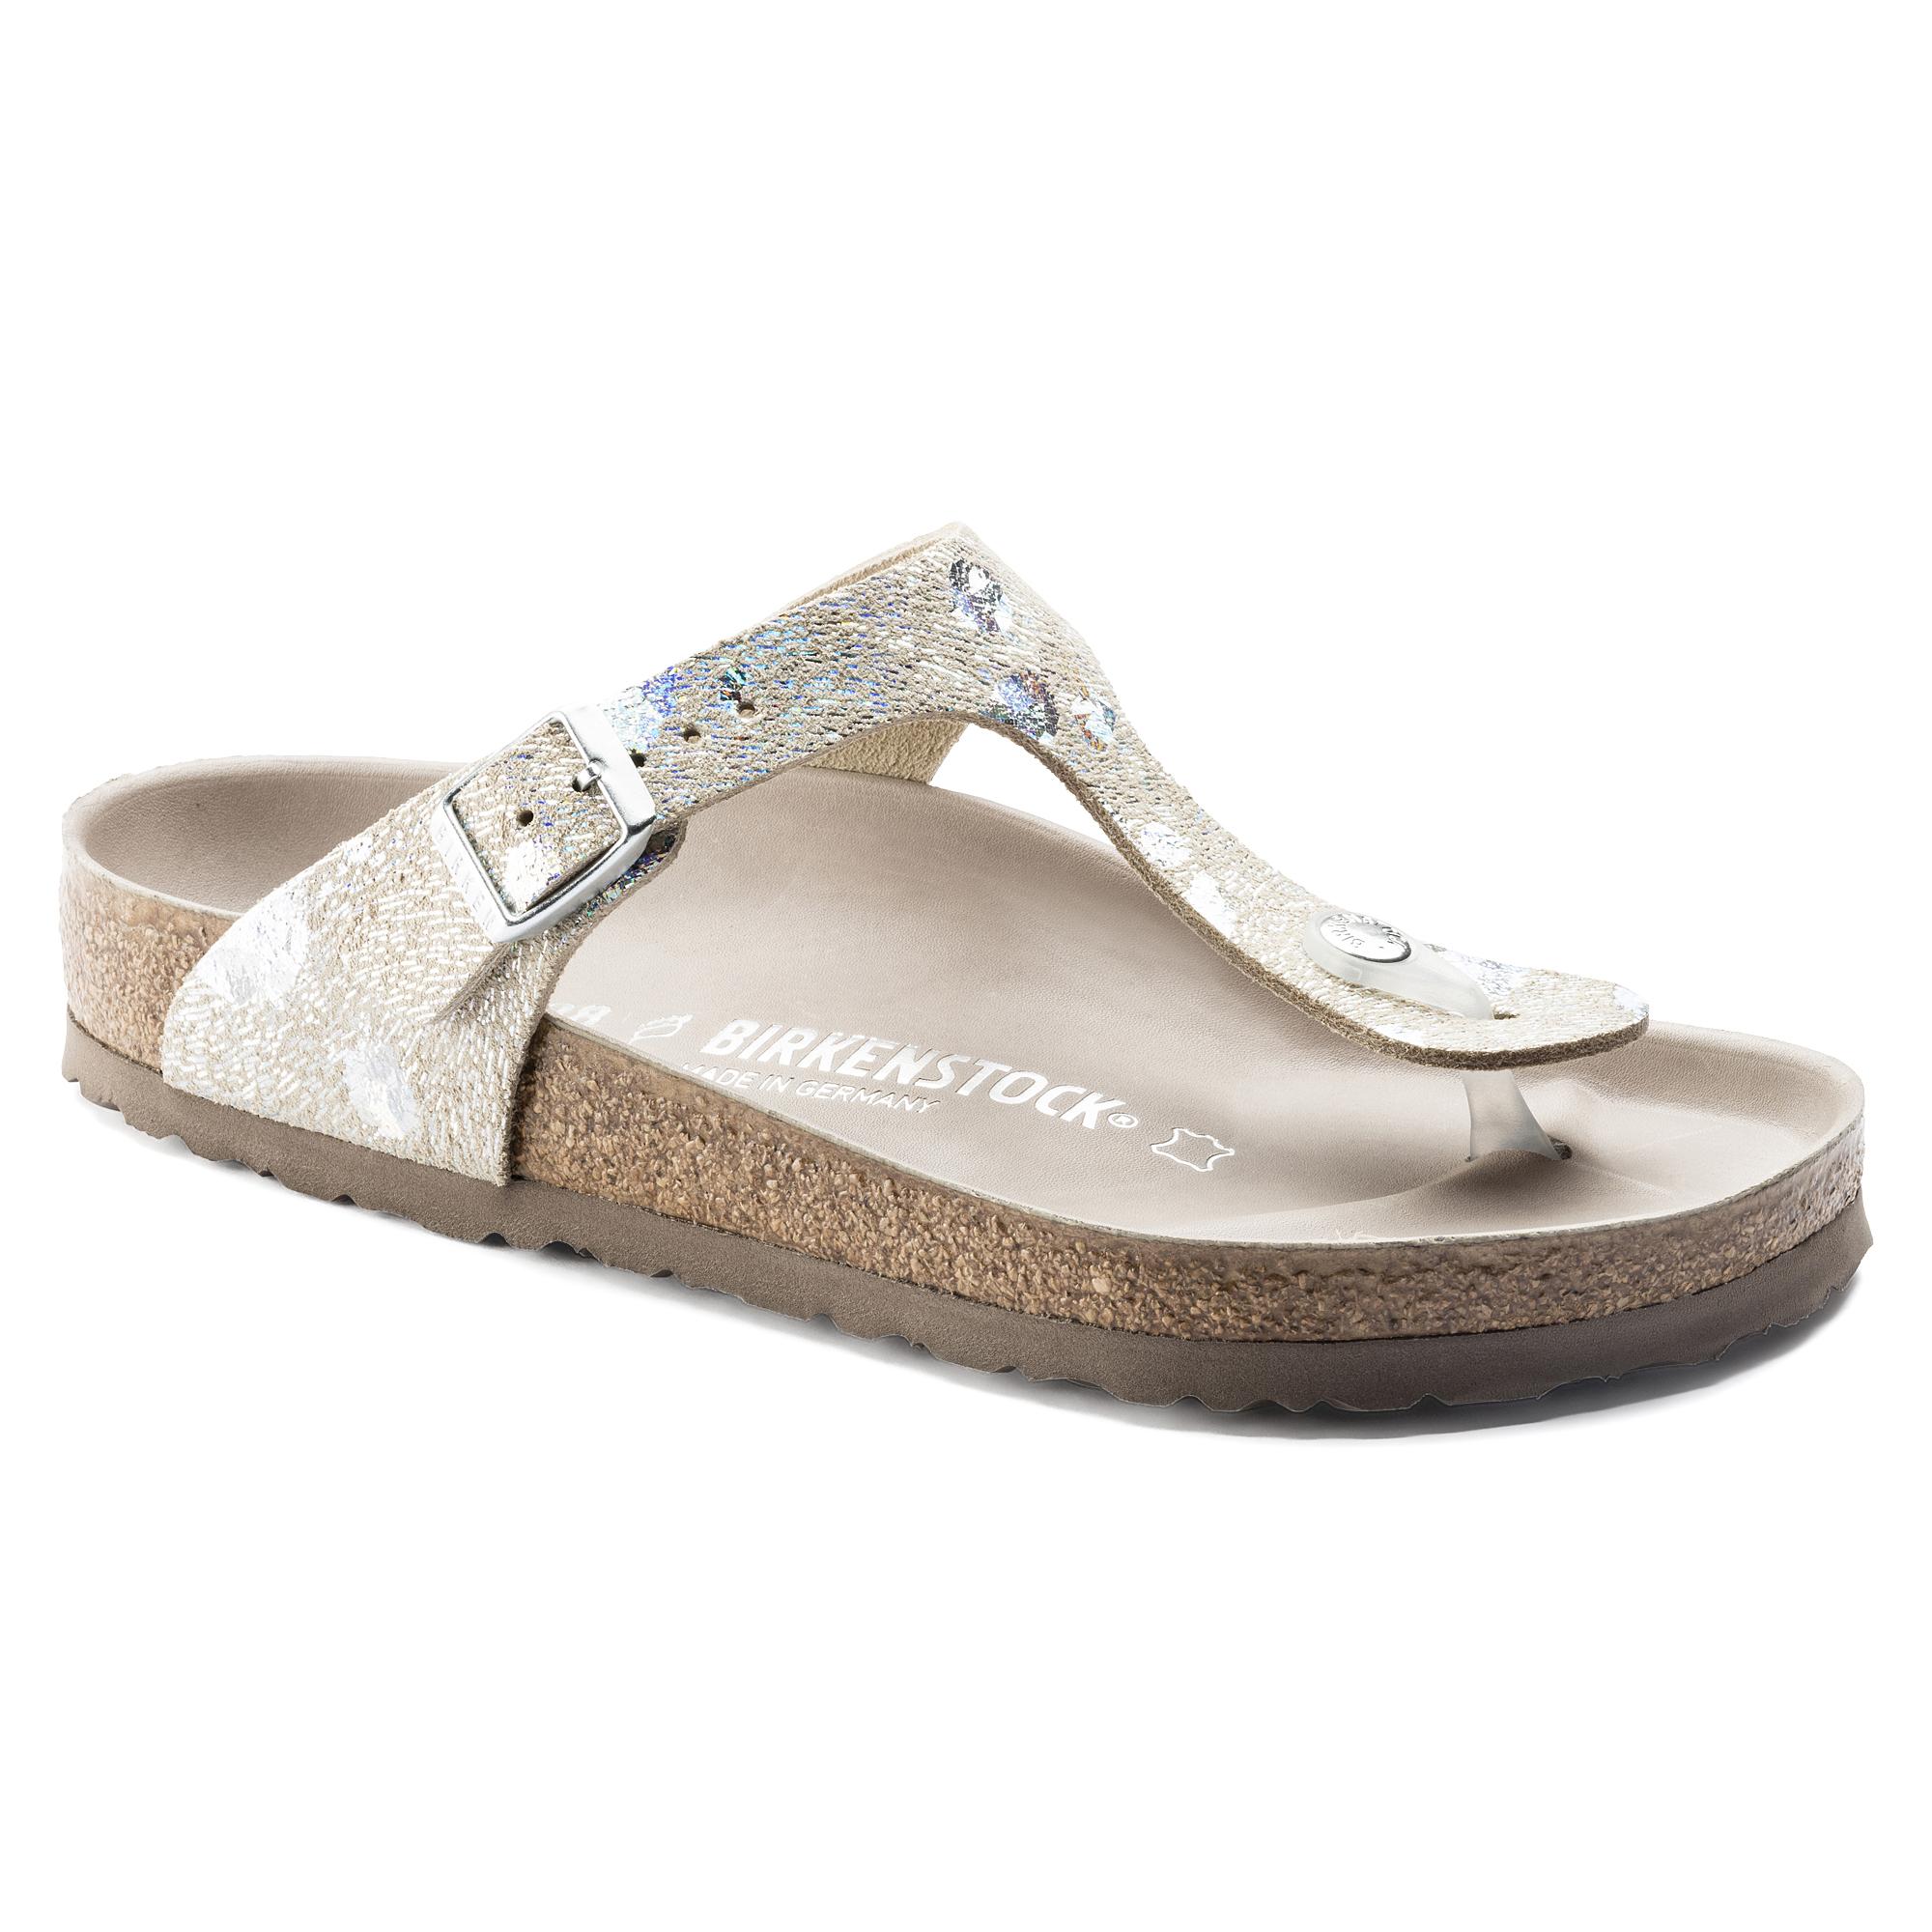 Birkenstock – Zehentrenner 'Gizeh BS' aus Leder – Silber